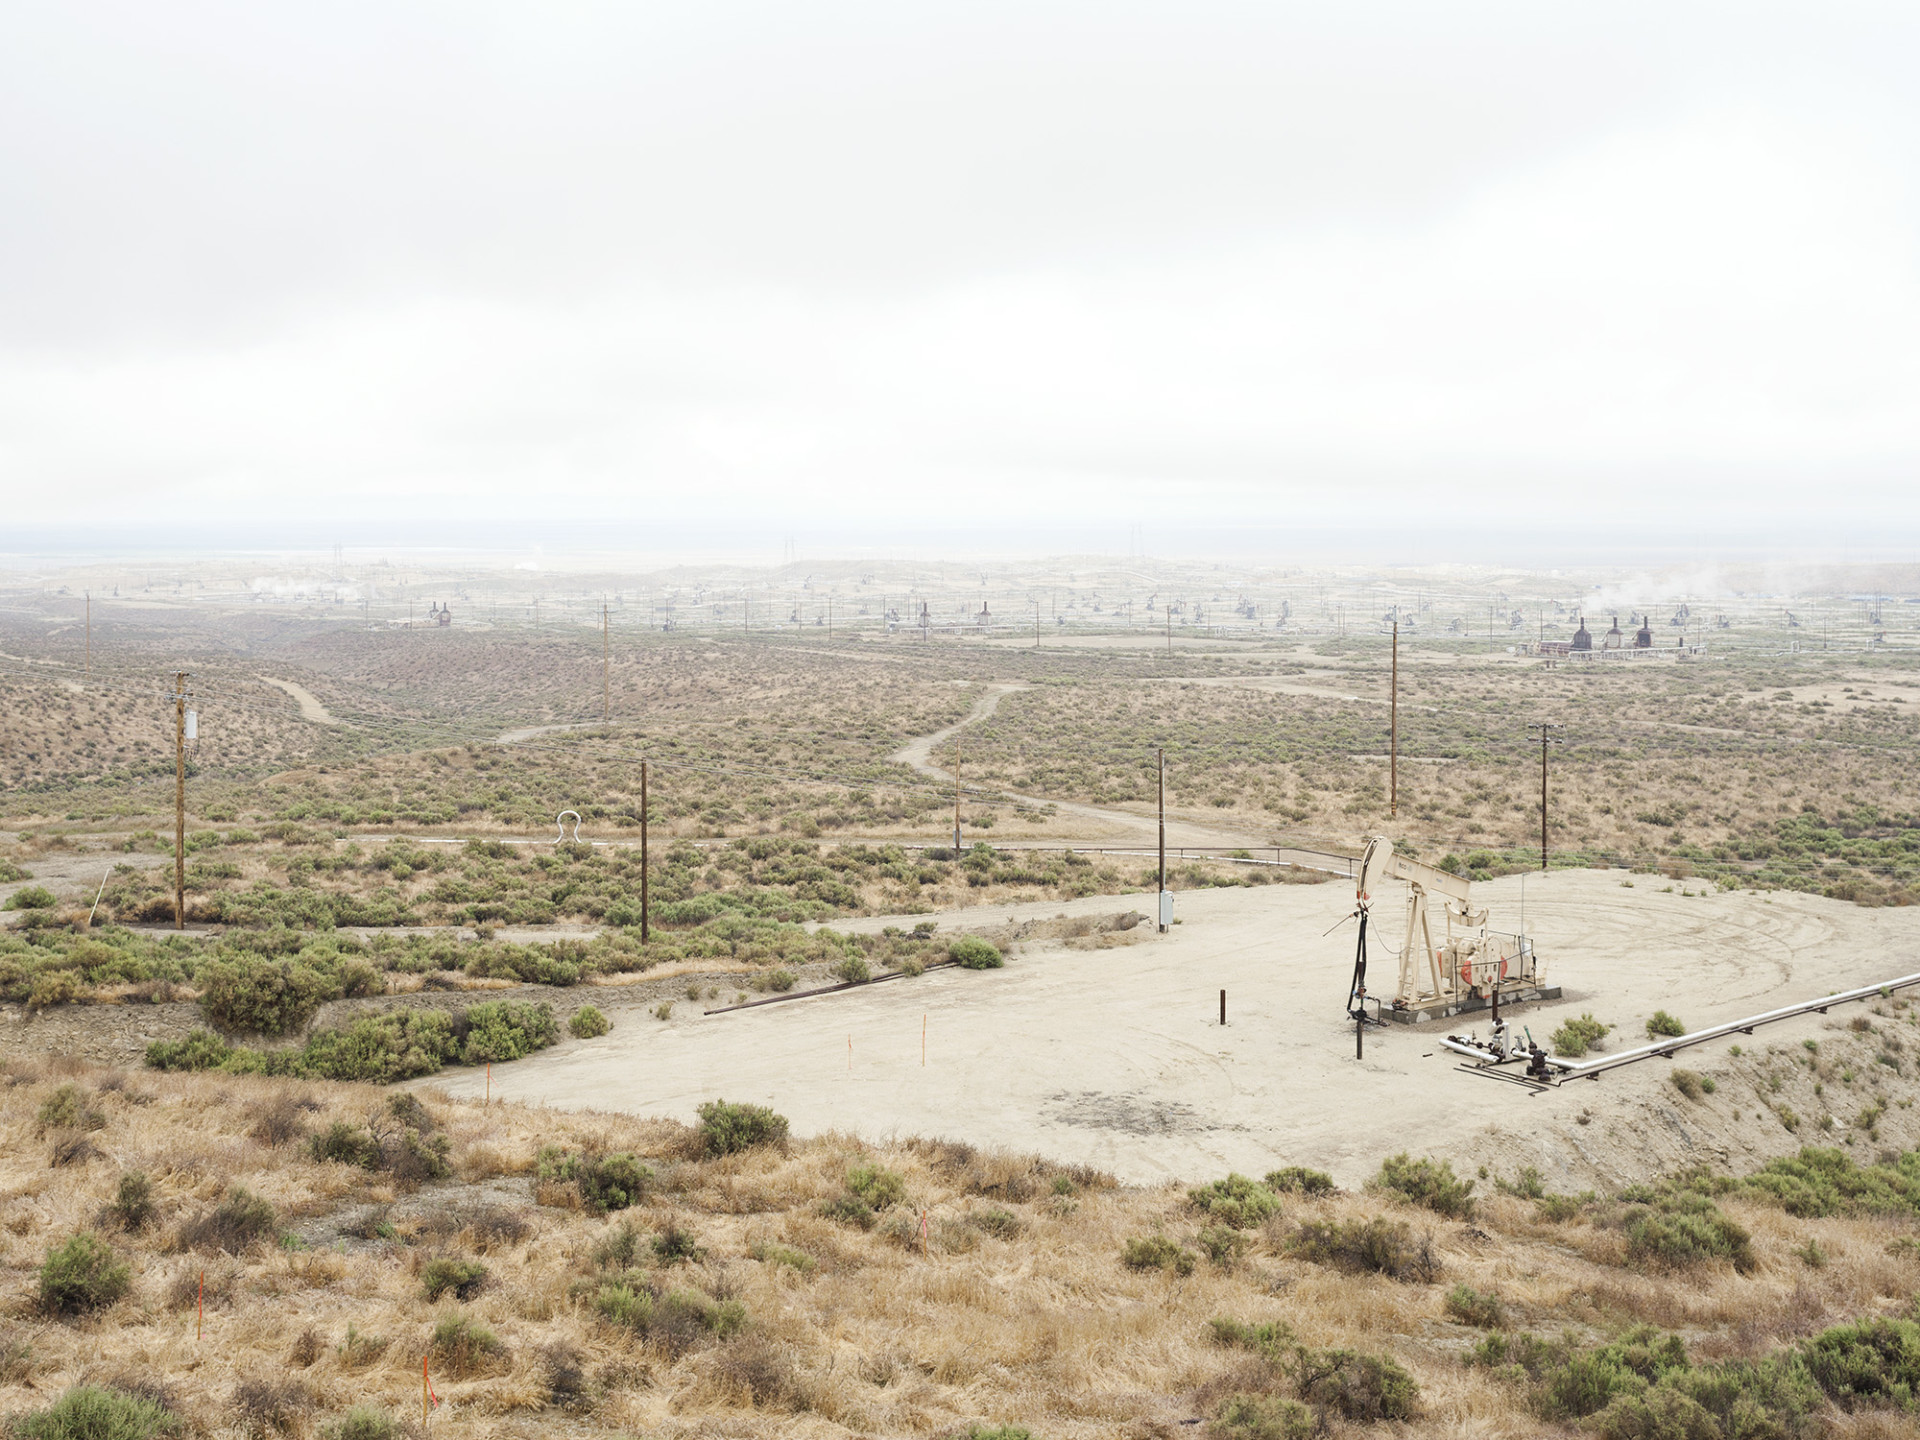 Gregor Schmidt American Landscape, 2017